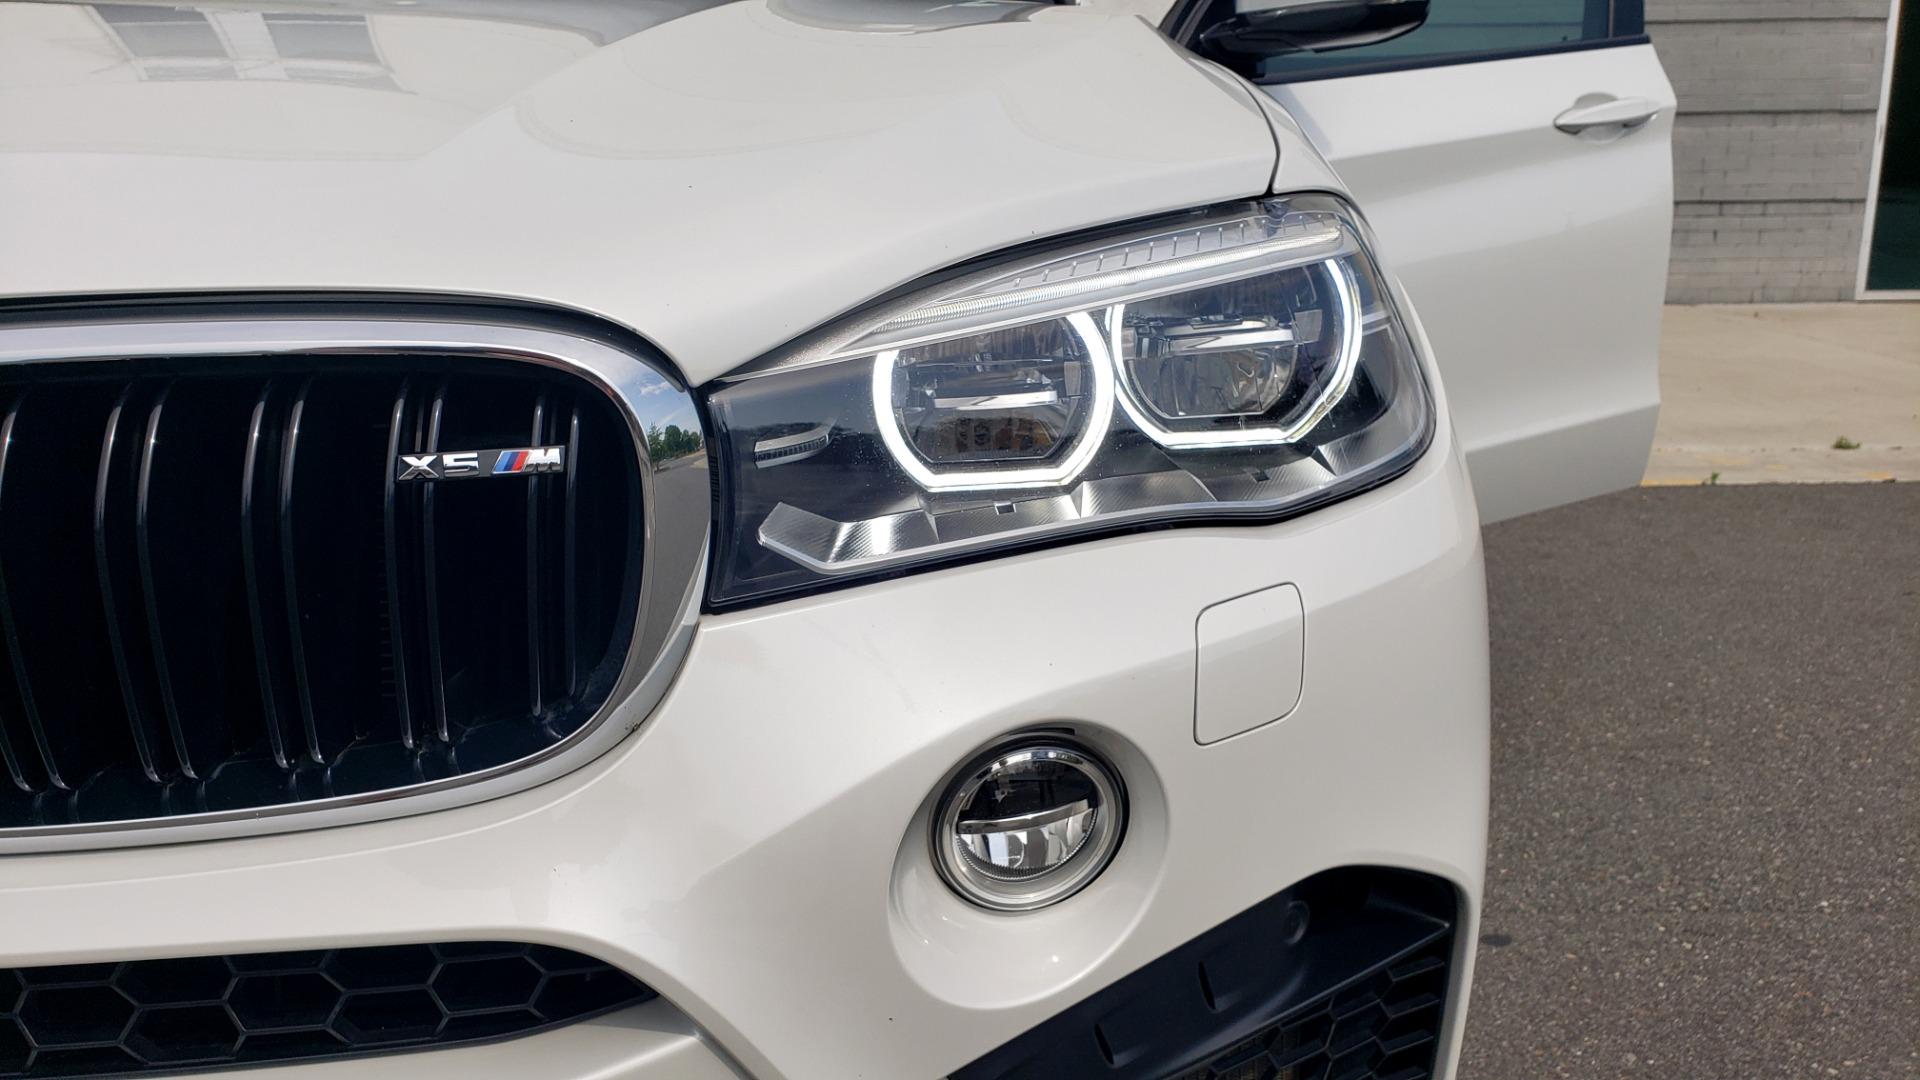 Used 2017 BMW X5 M EXECUTIVE PKG / NAV / DRVR ASST / BSM / HUD / HTD STS / WIFI for sale Sold at Formula Imports in Charlotte NC 28227 24